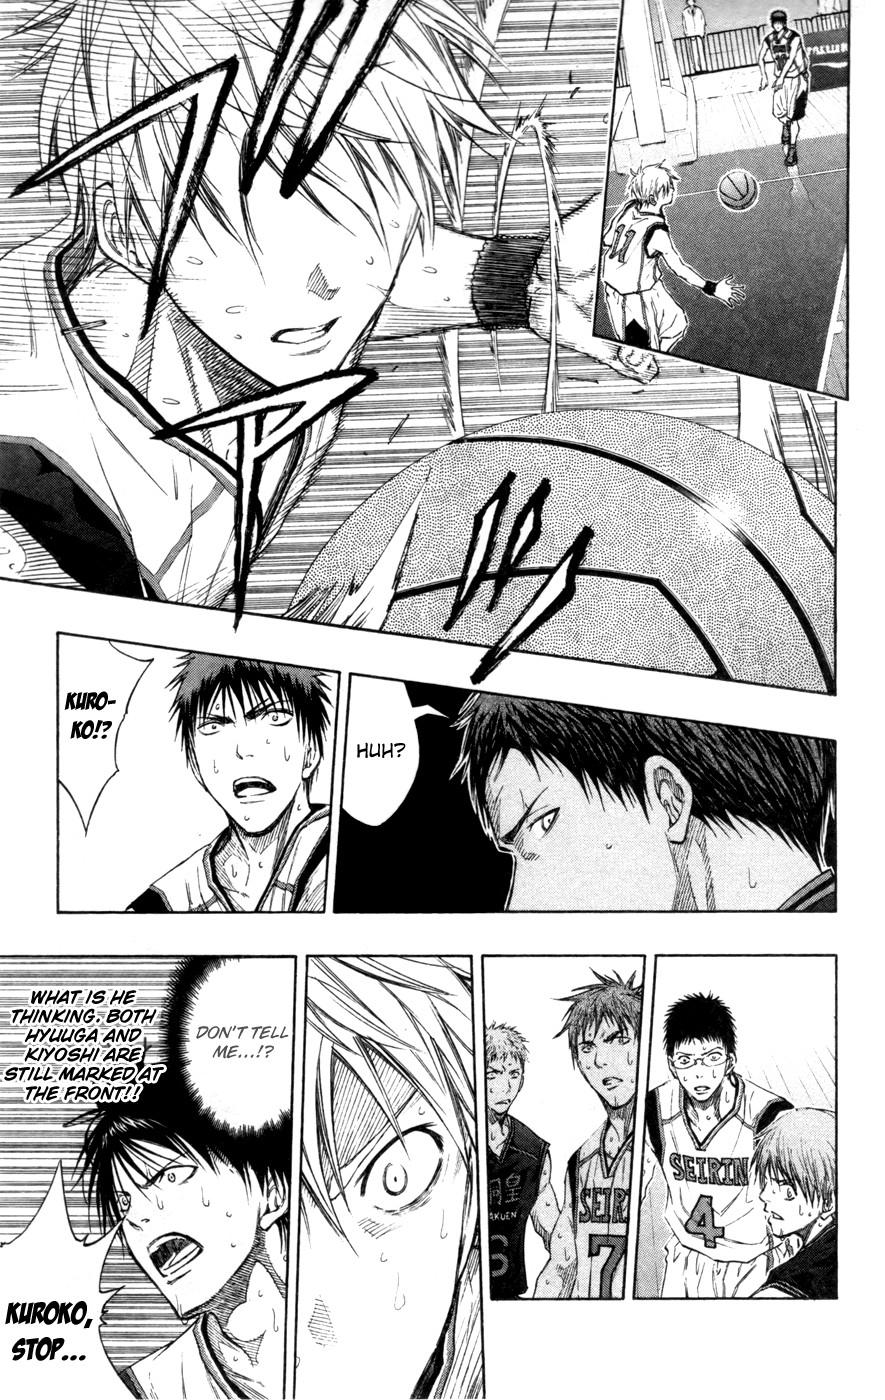 Kuroko no Basket Manga Chapter 120 - Image 5